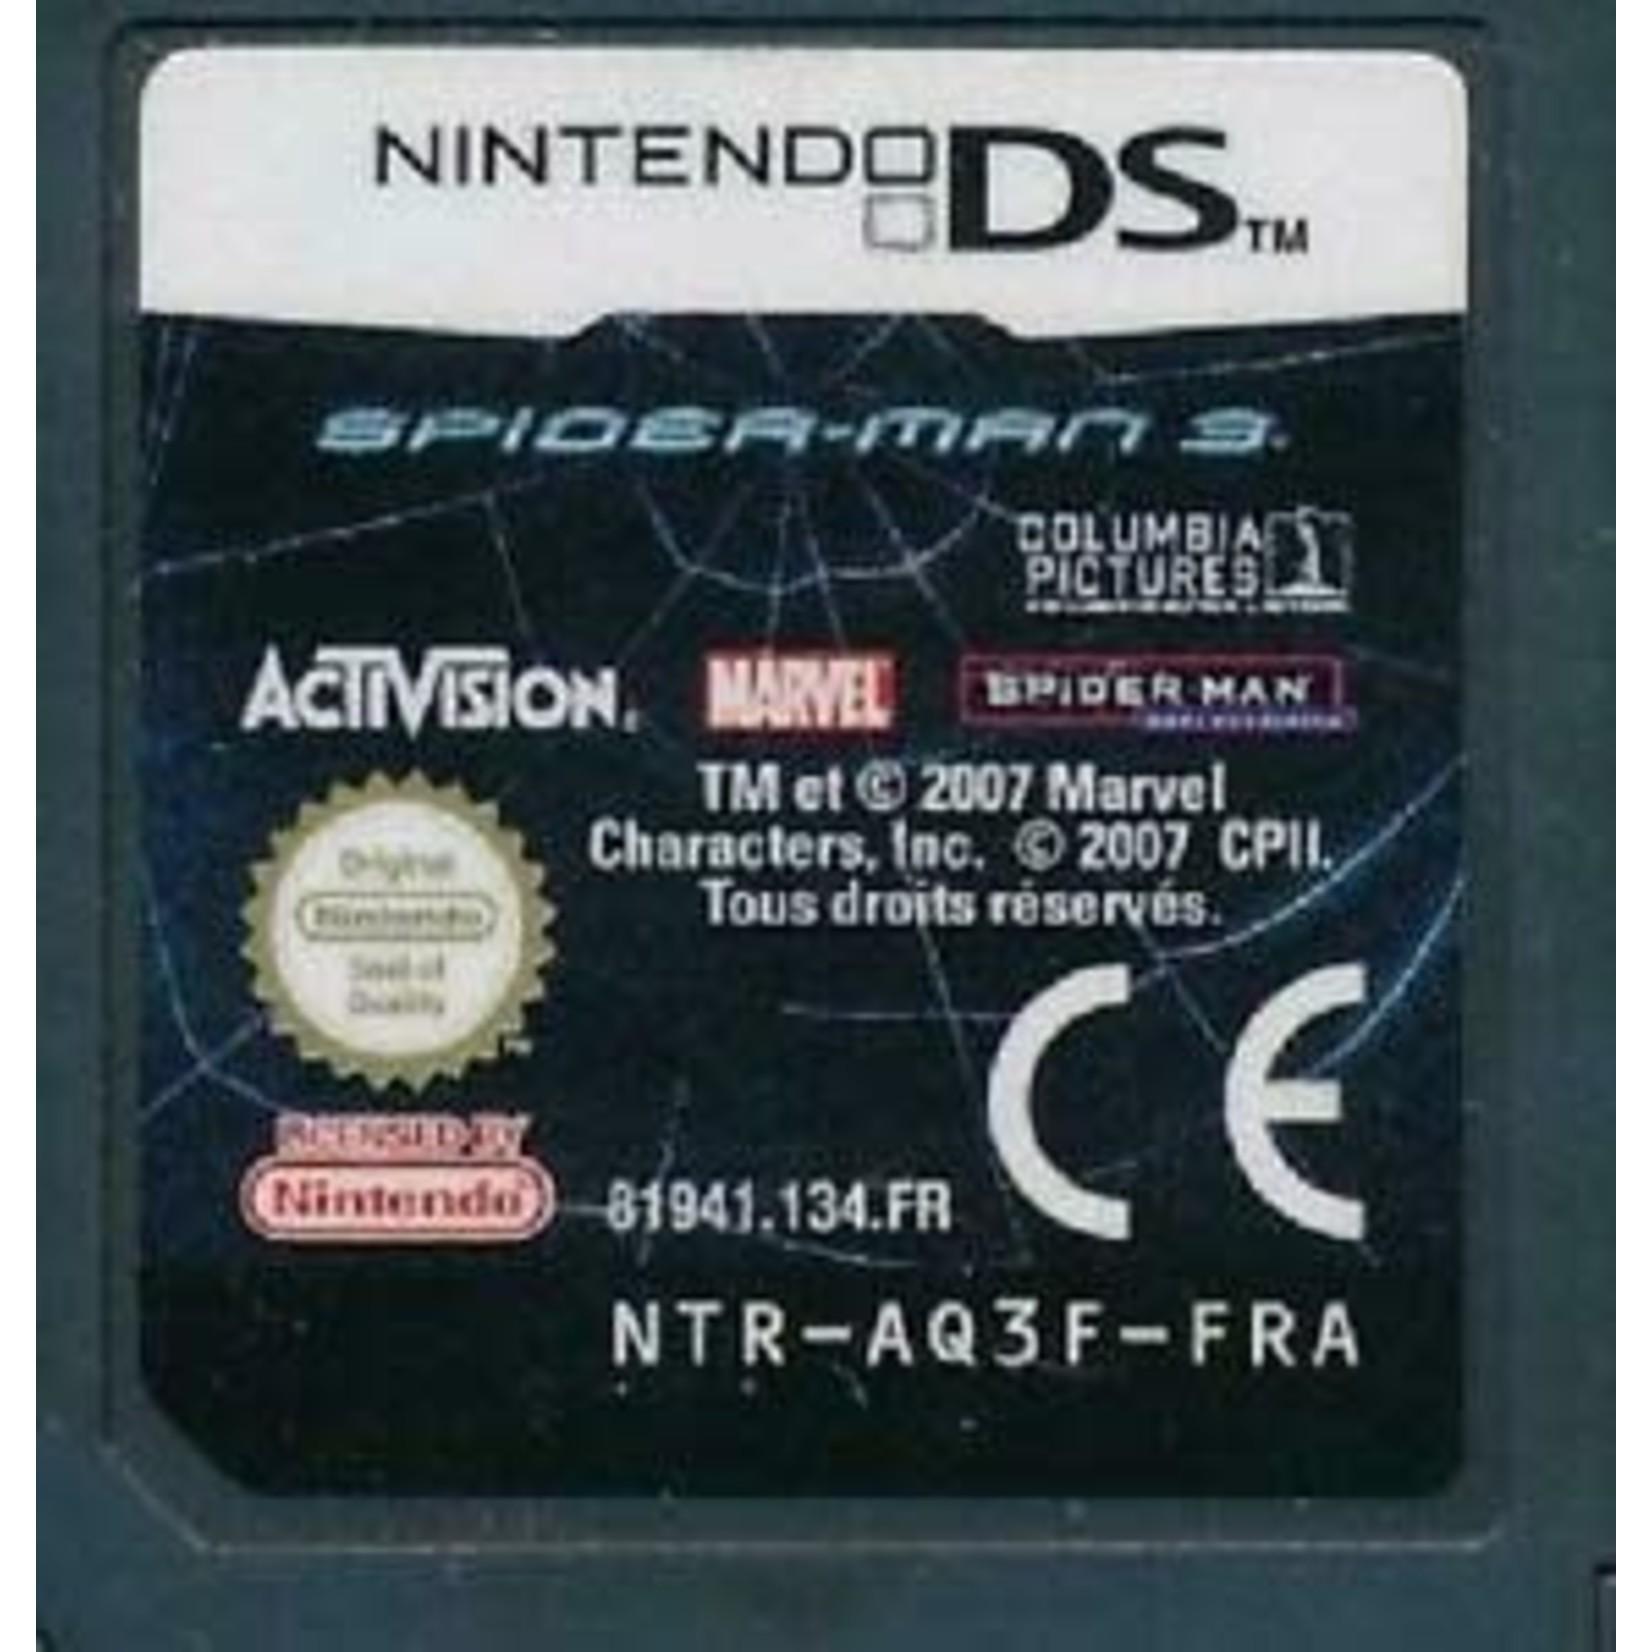 dsu-Spiderman 3 (cartridge)